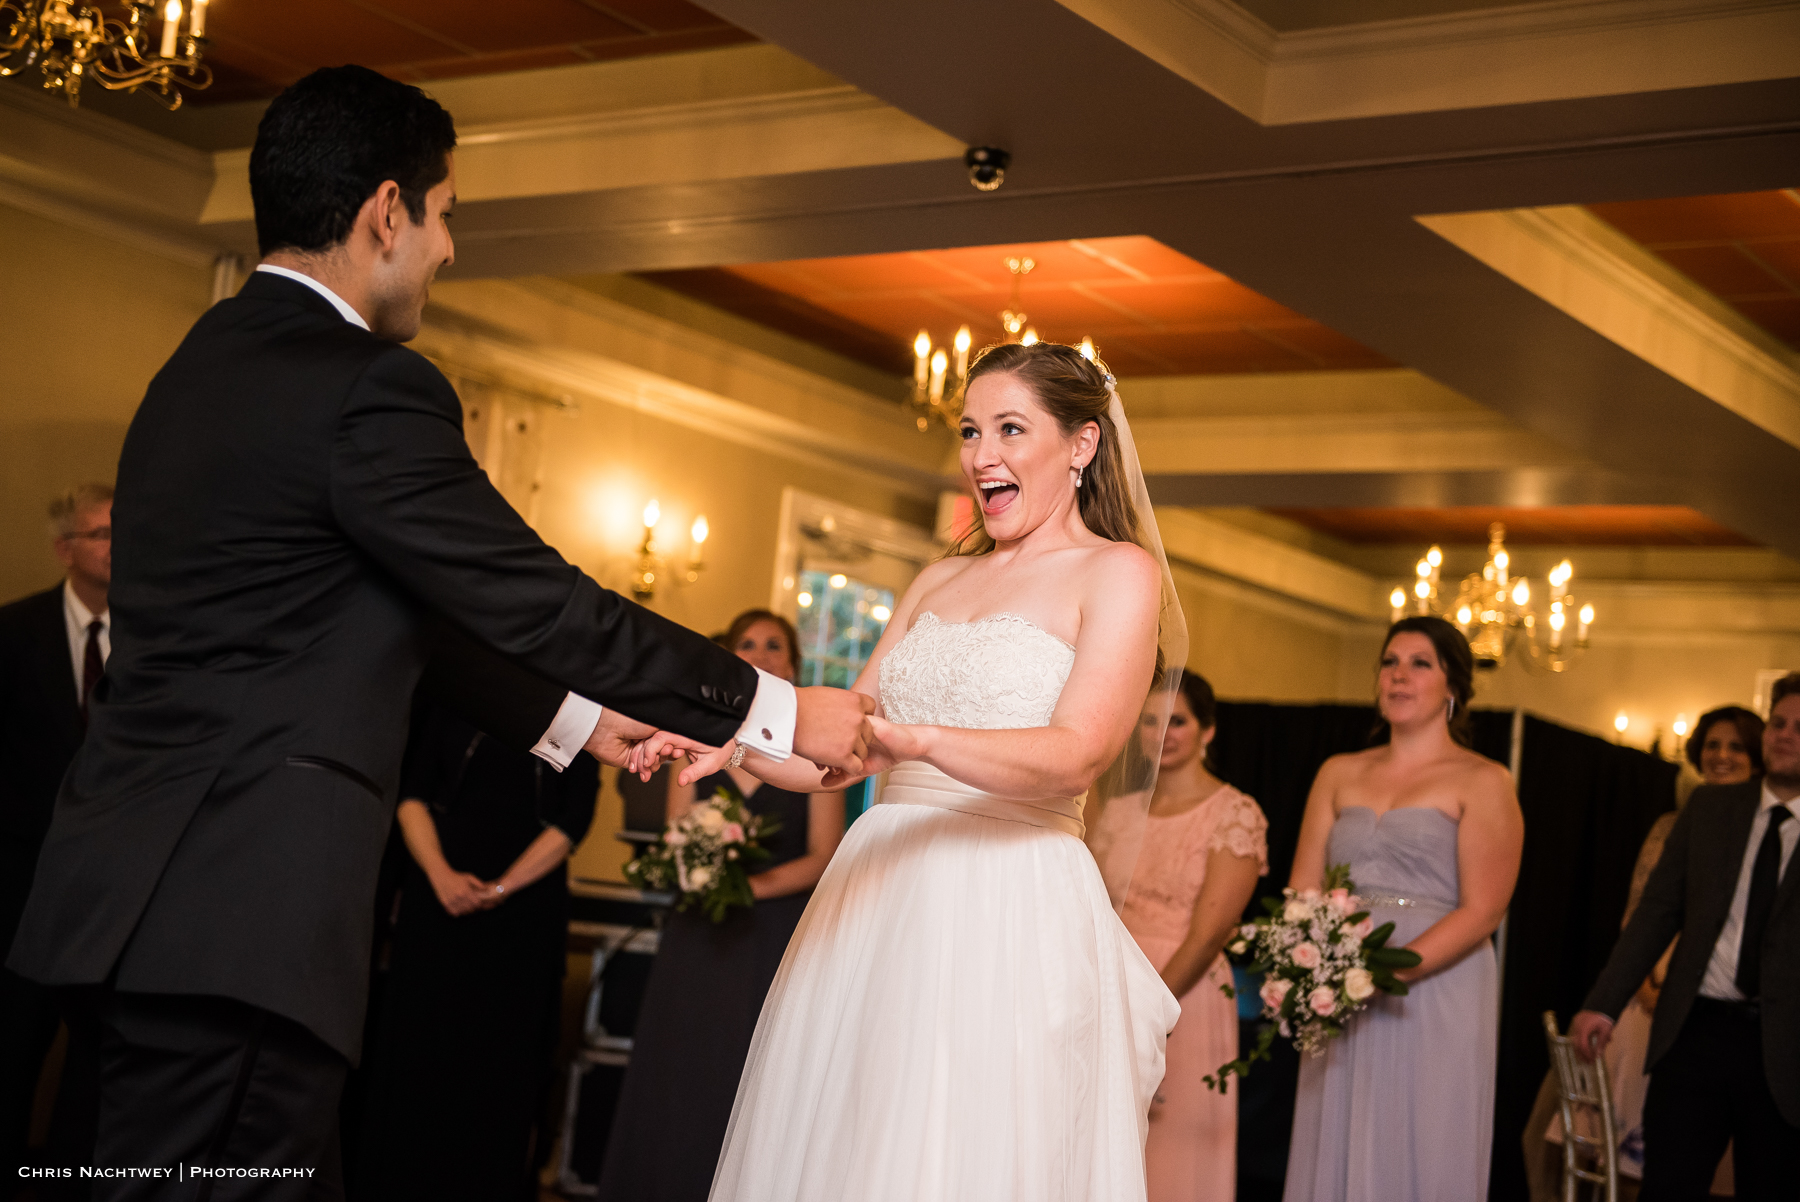 wedding-the-litchfield-inn-ct-photos-chris-nachtwey-photography-2018-51.jpg